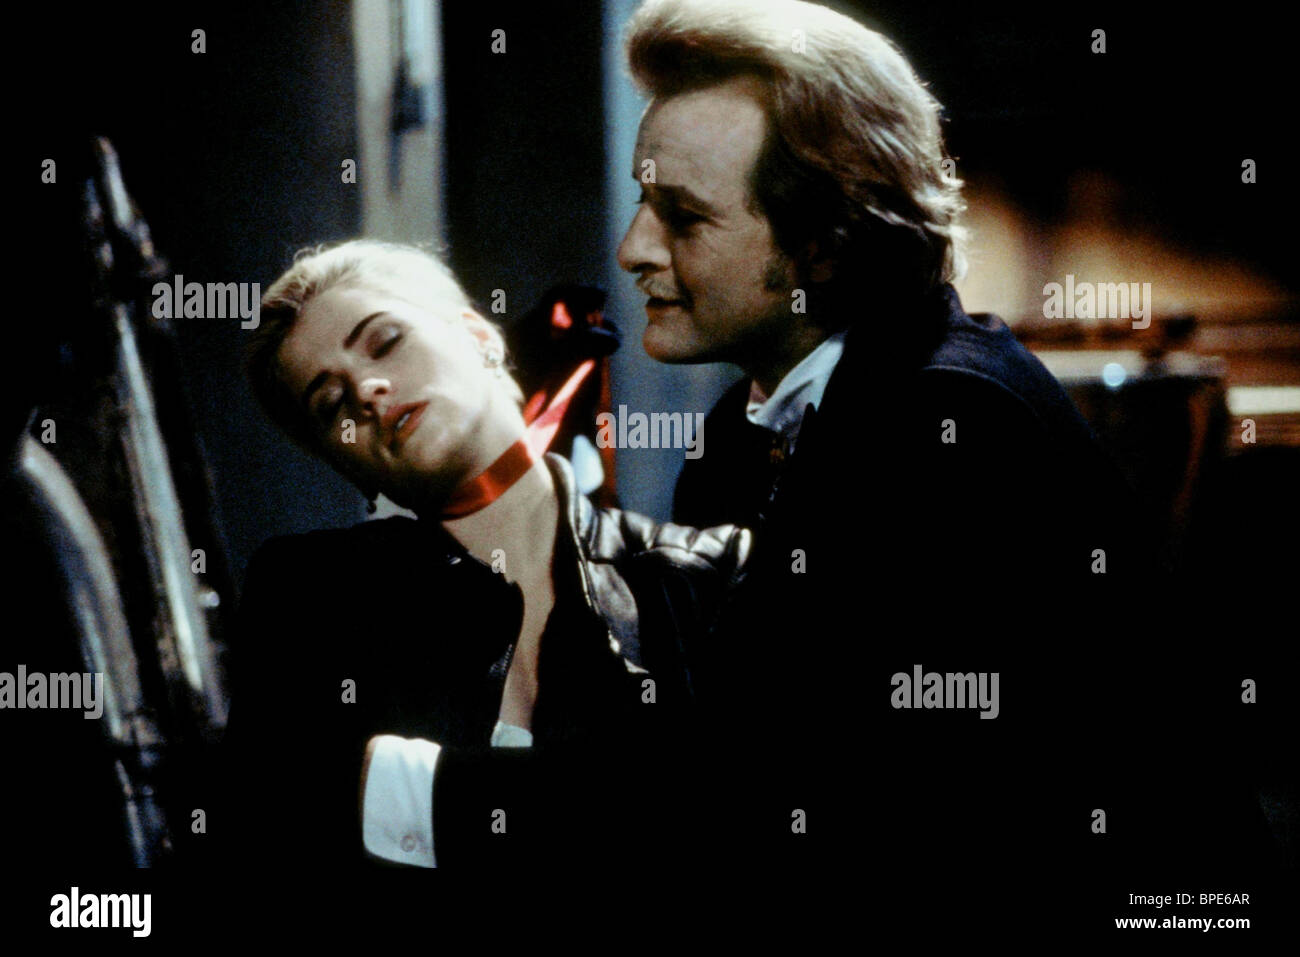 KRISTY SWANSON, RUTGER HAUER, BUFFY THE VAMPIRE SLAYER, 1992 - Stock Image